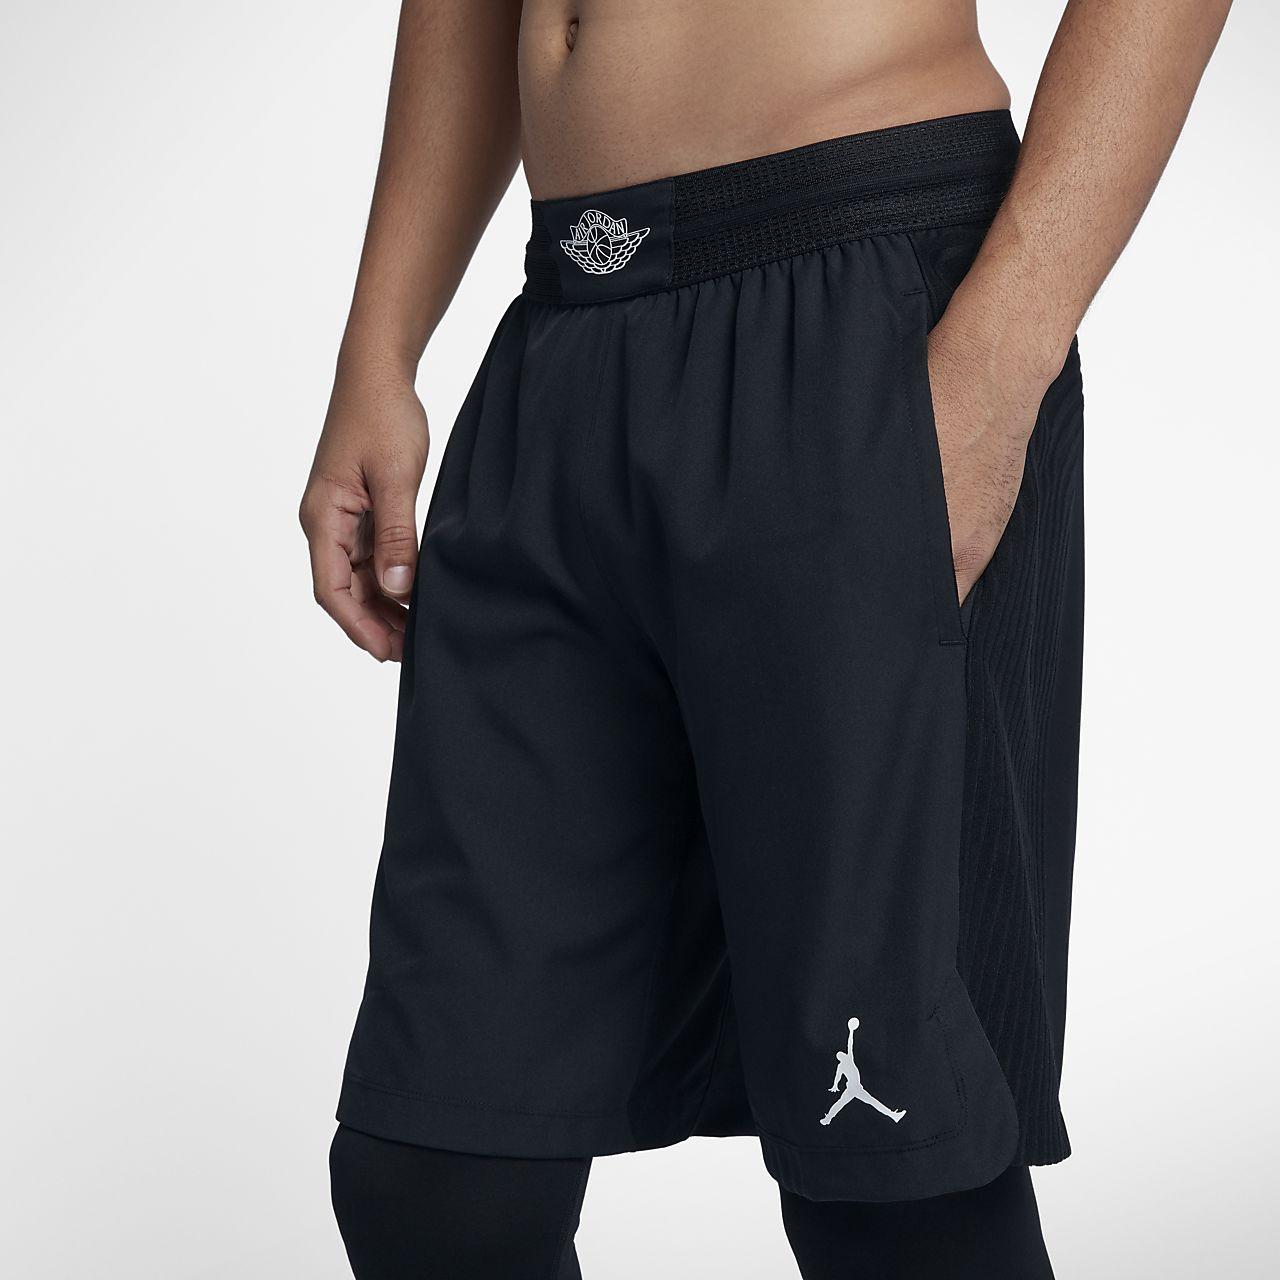 ... Jordan Ultimate Flight Men's Basketball Shorts